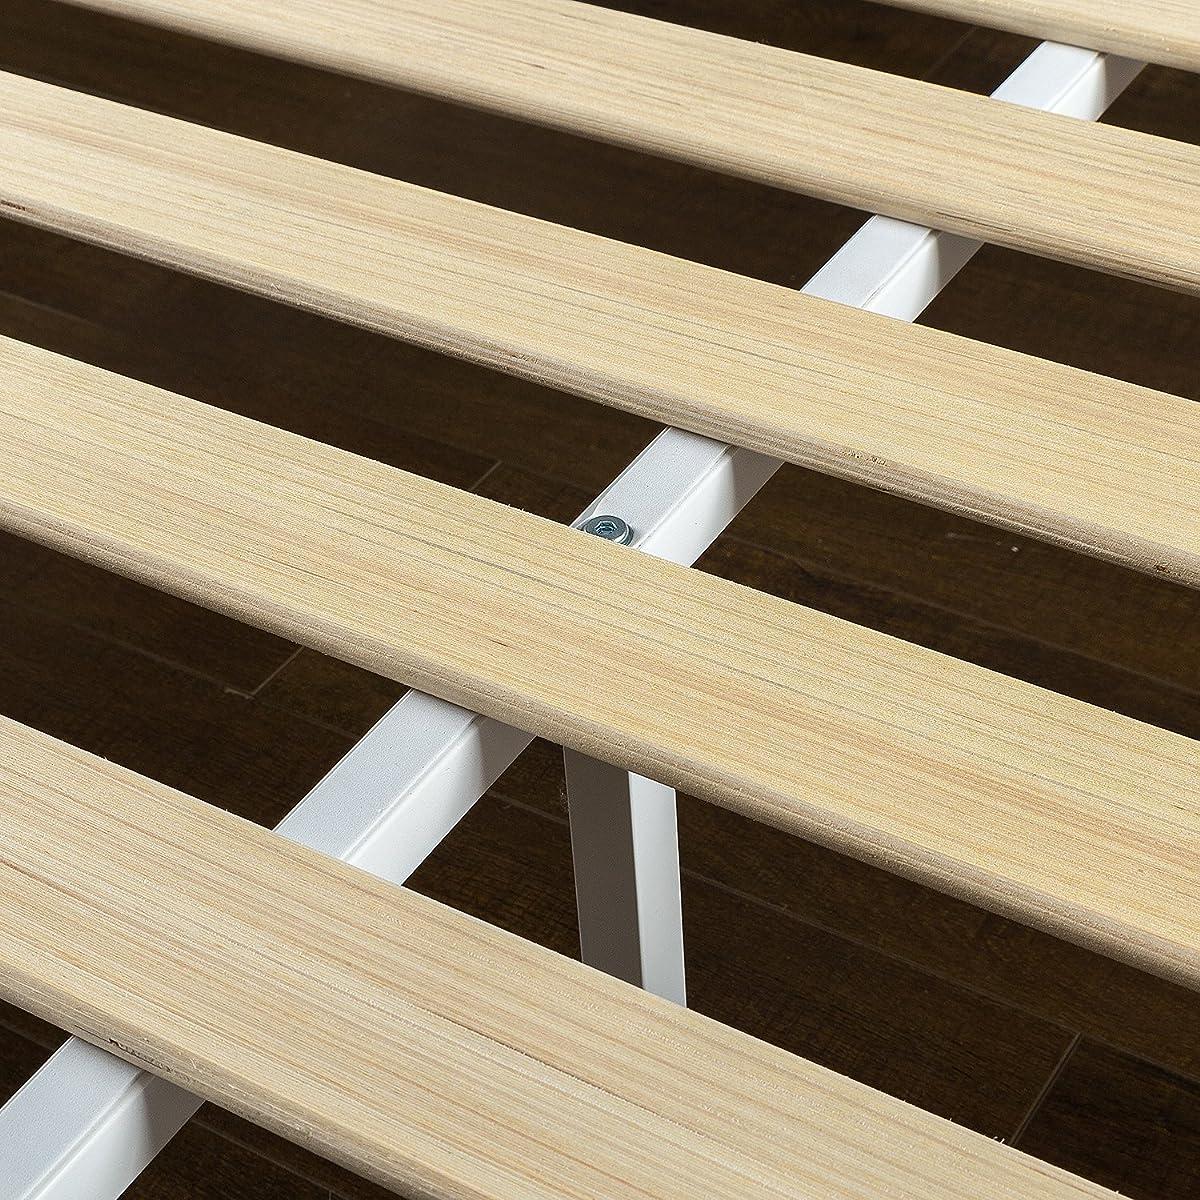 Zinus Deluxe Wood Platform Bed with Slatted Headboard / No Box Spring Needed / Wood Slat Support, Queen